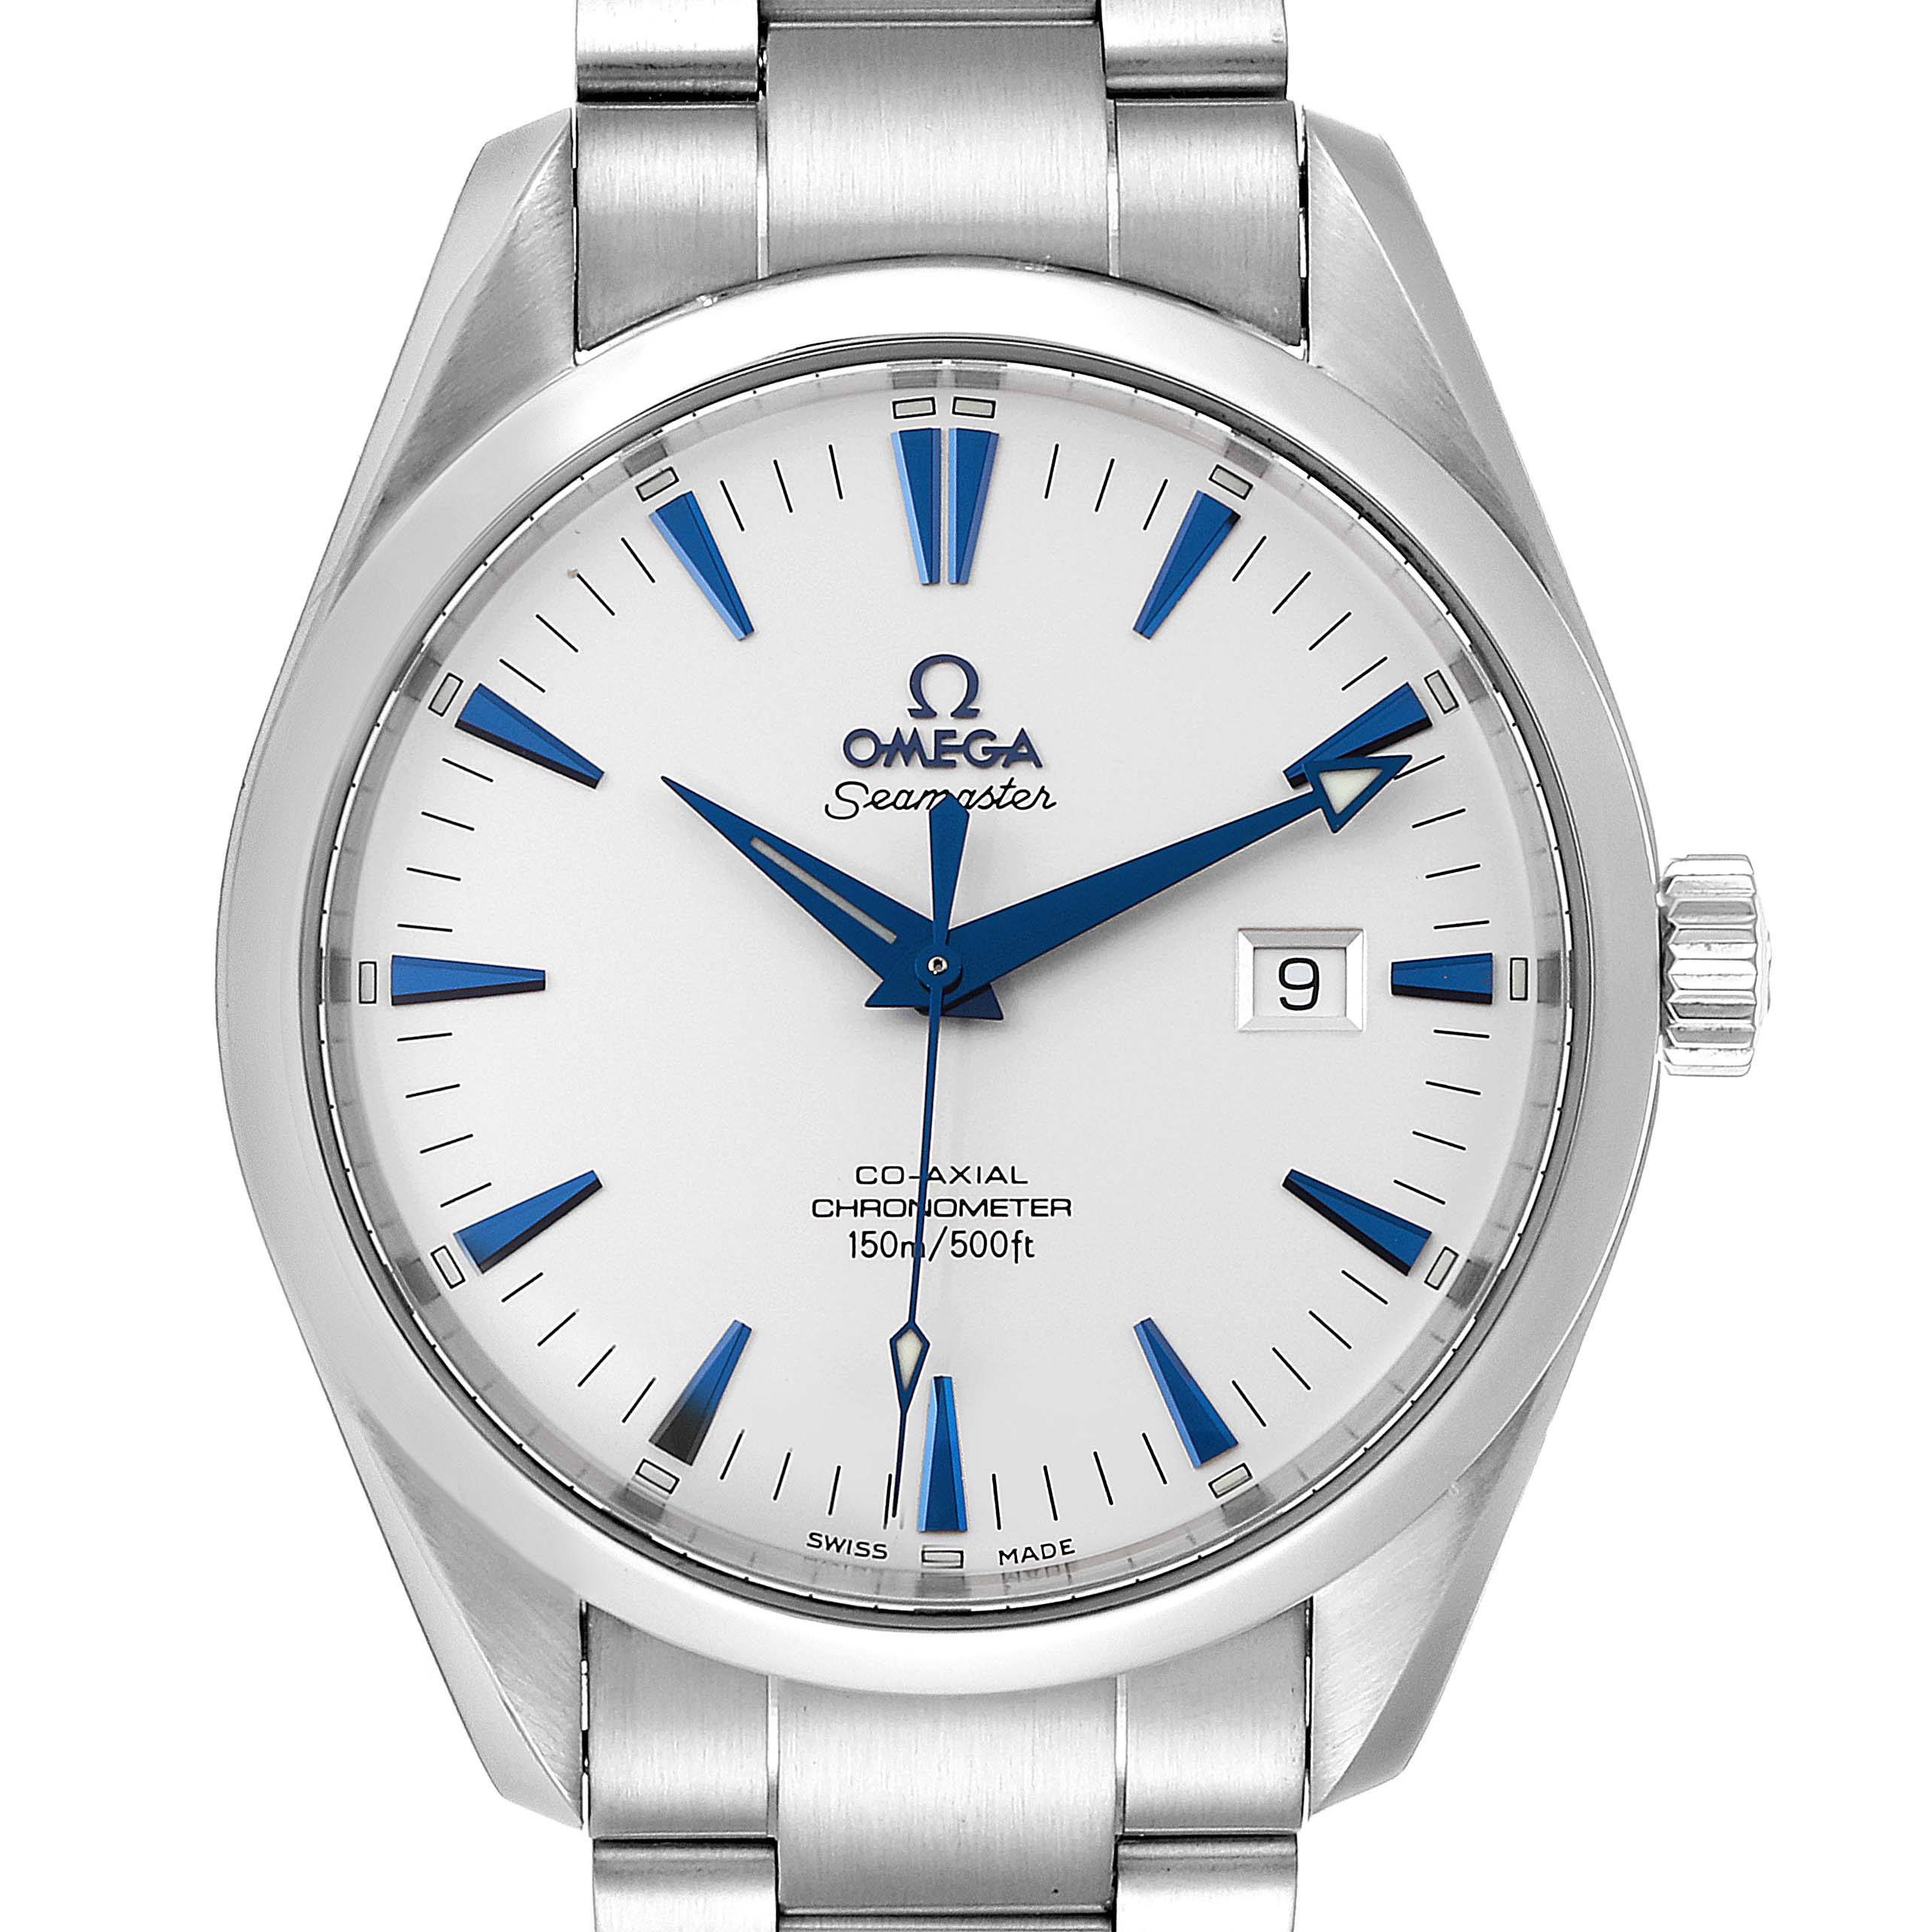 Omega Seamaster Aqua Terra Big Size Steel Mens Watch 2502.33.00 SwissWatchExpo